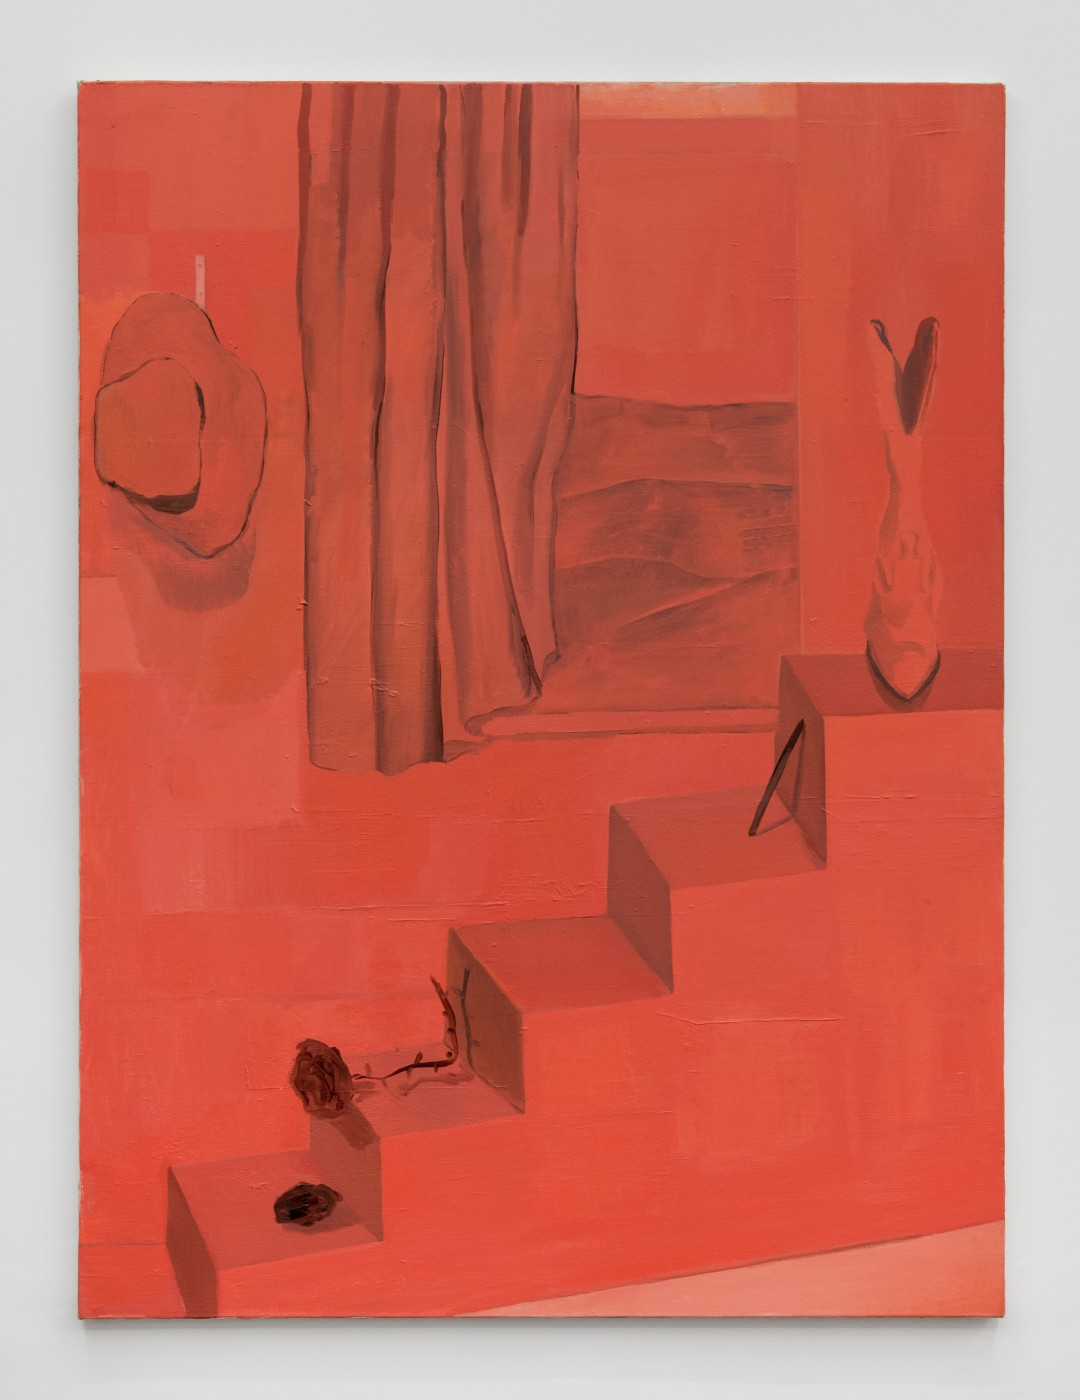 ♥ Allison Katz,  Untitled  , 2013   Acrylic on canvas   154 x 114 cm / 66.6 x 44.8 in OLGA BALEMA  DAVID DOUARD  ALLISON KATZ  BRADLEY KRONZ  TOM HUMPHRIES  HAN-CHRISTIAN LOTZ  LAURE PROUVOST